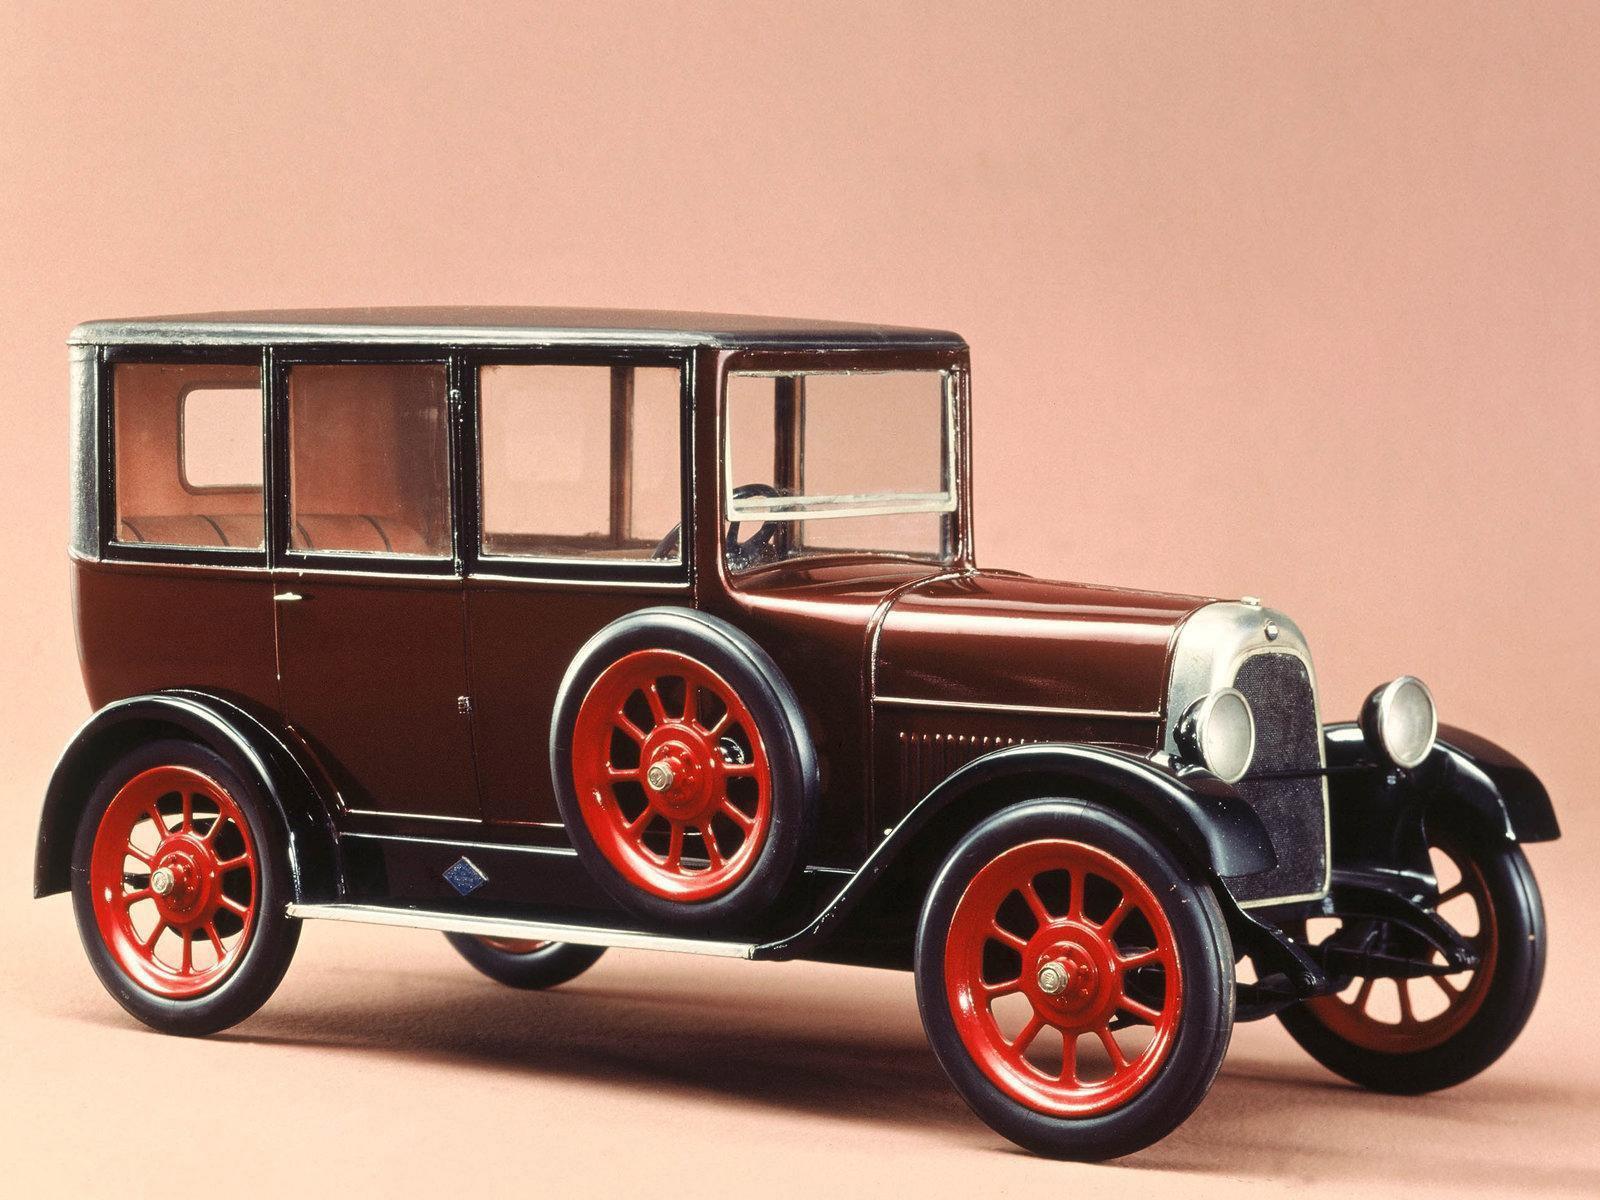 1919 Fiat 501 Saloon